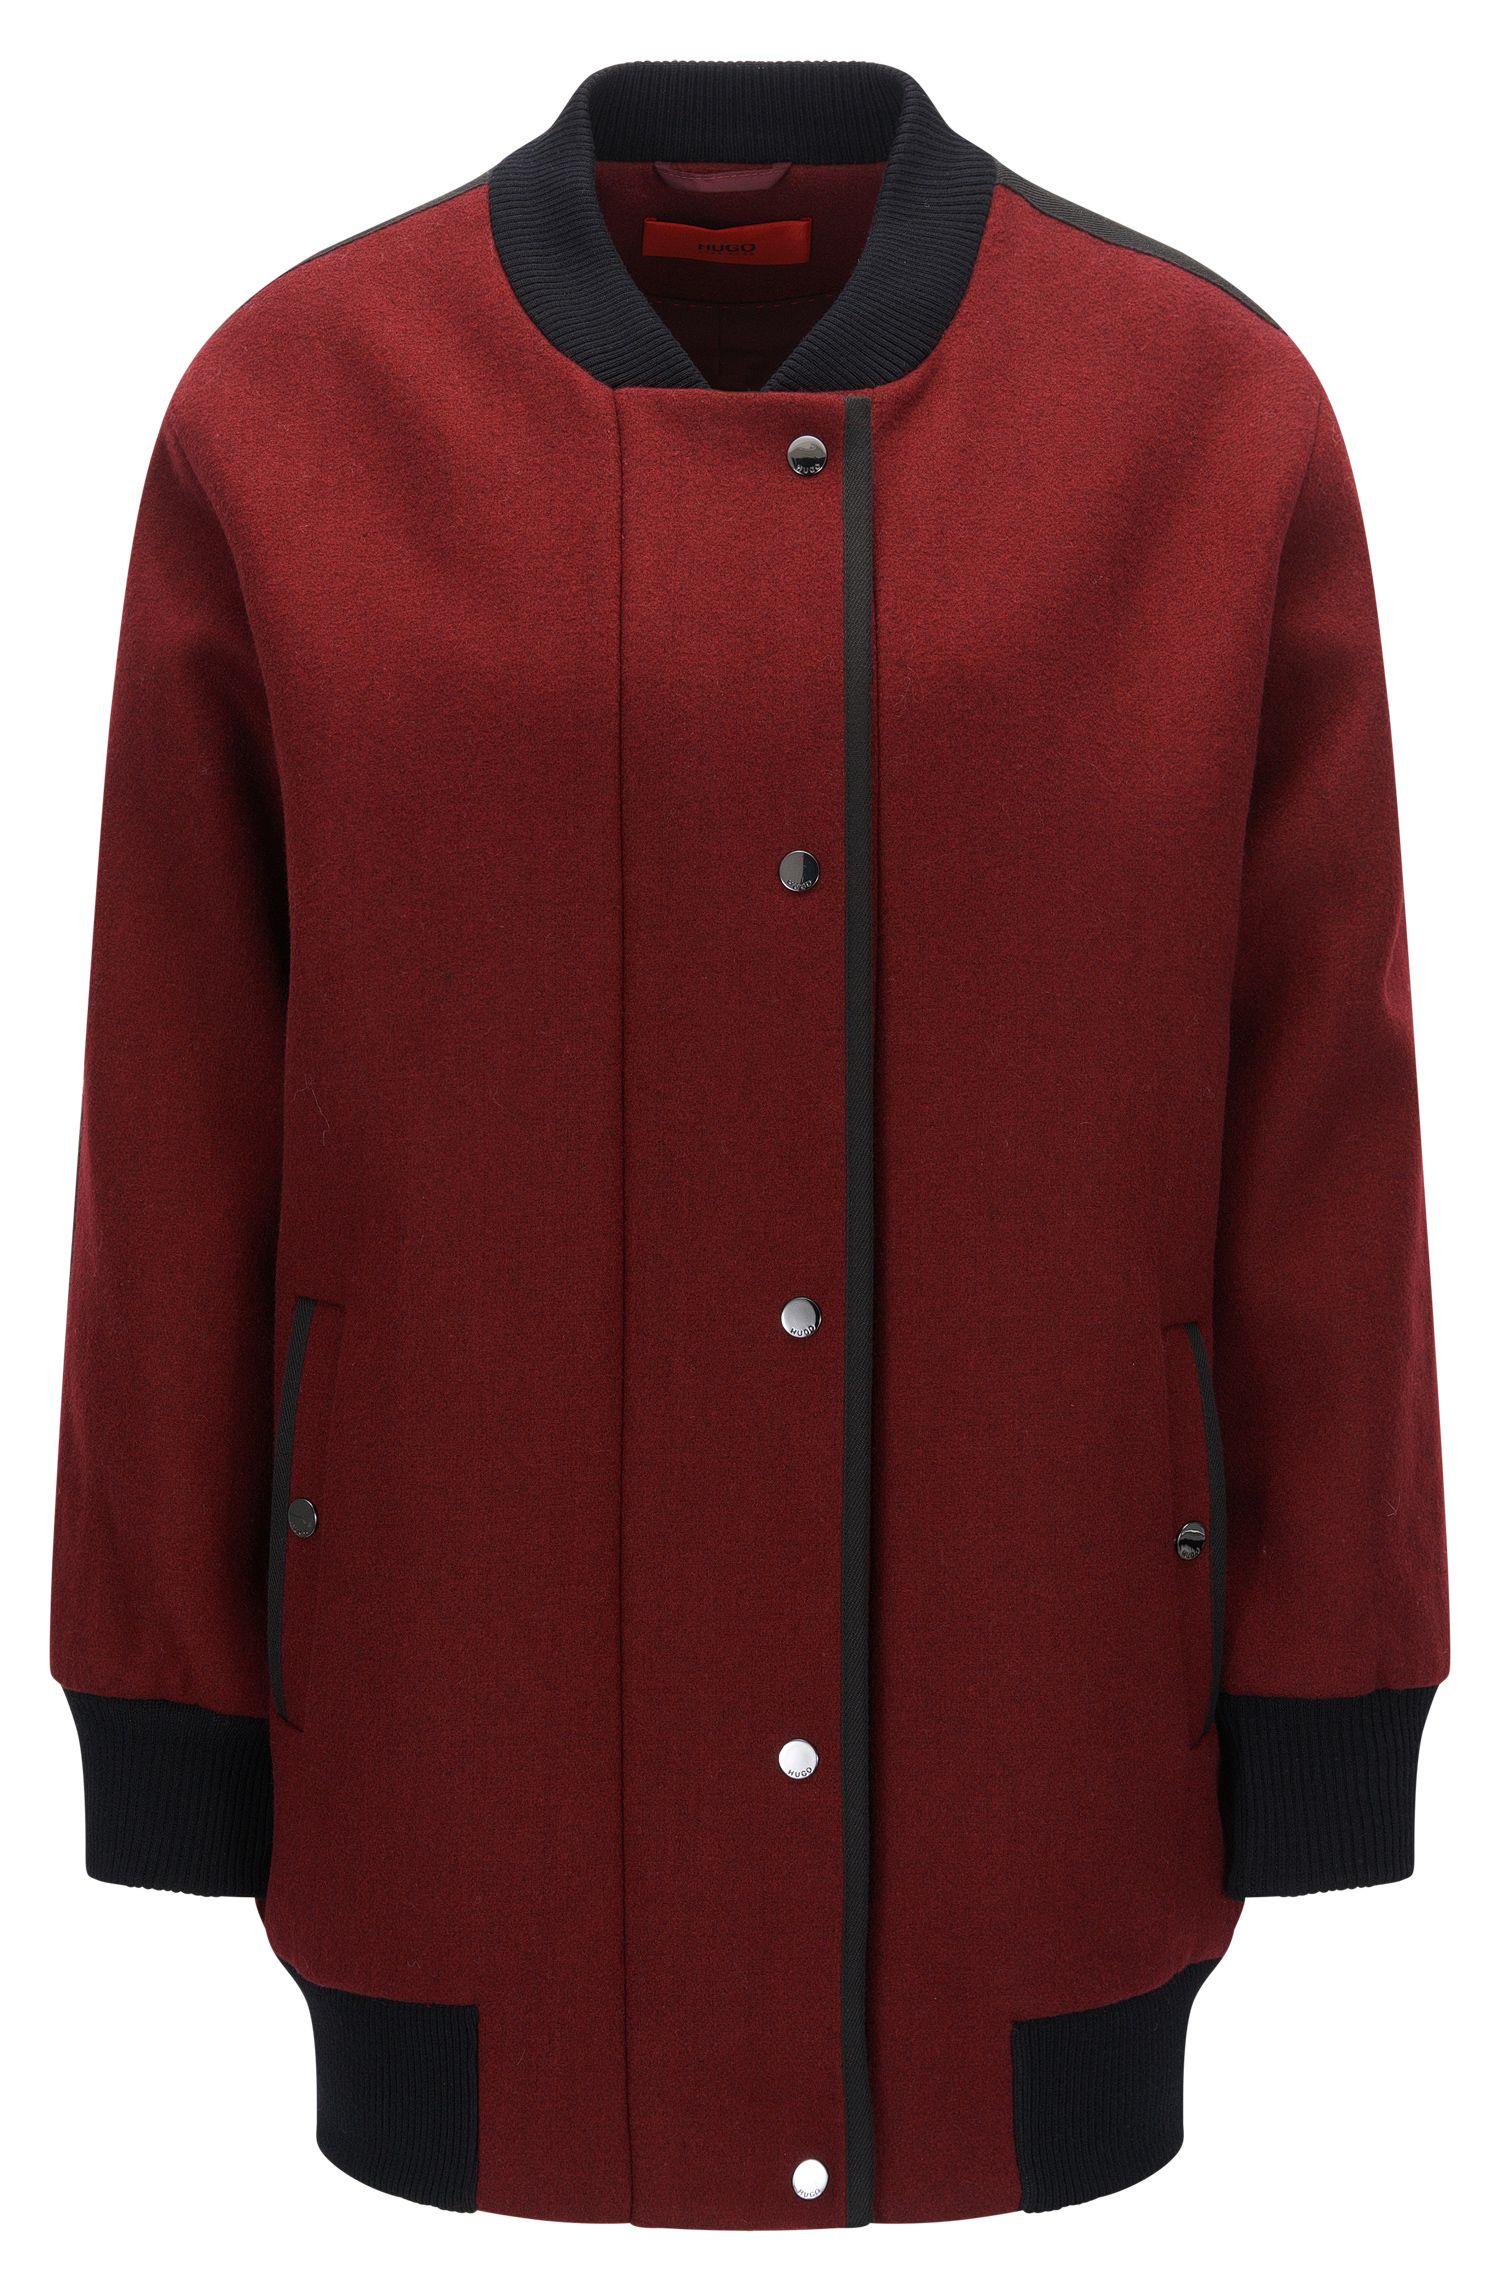 'Fipani' | Wool Blend Long Varsity Jacket